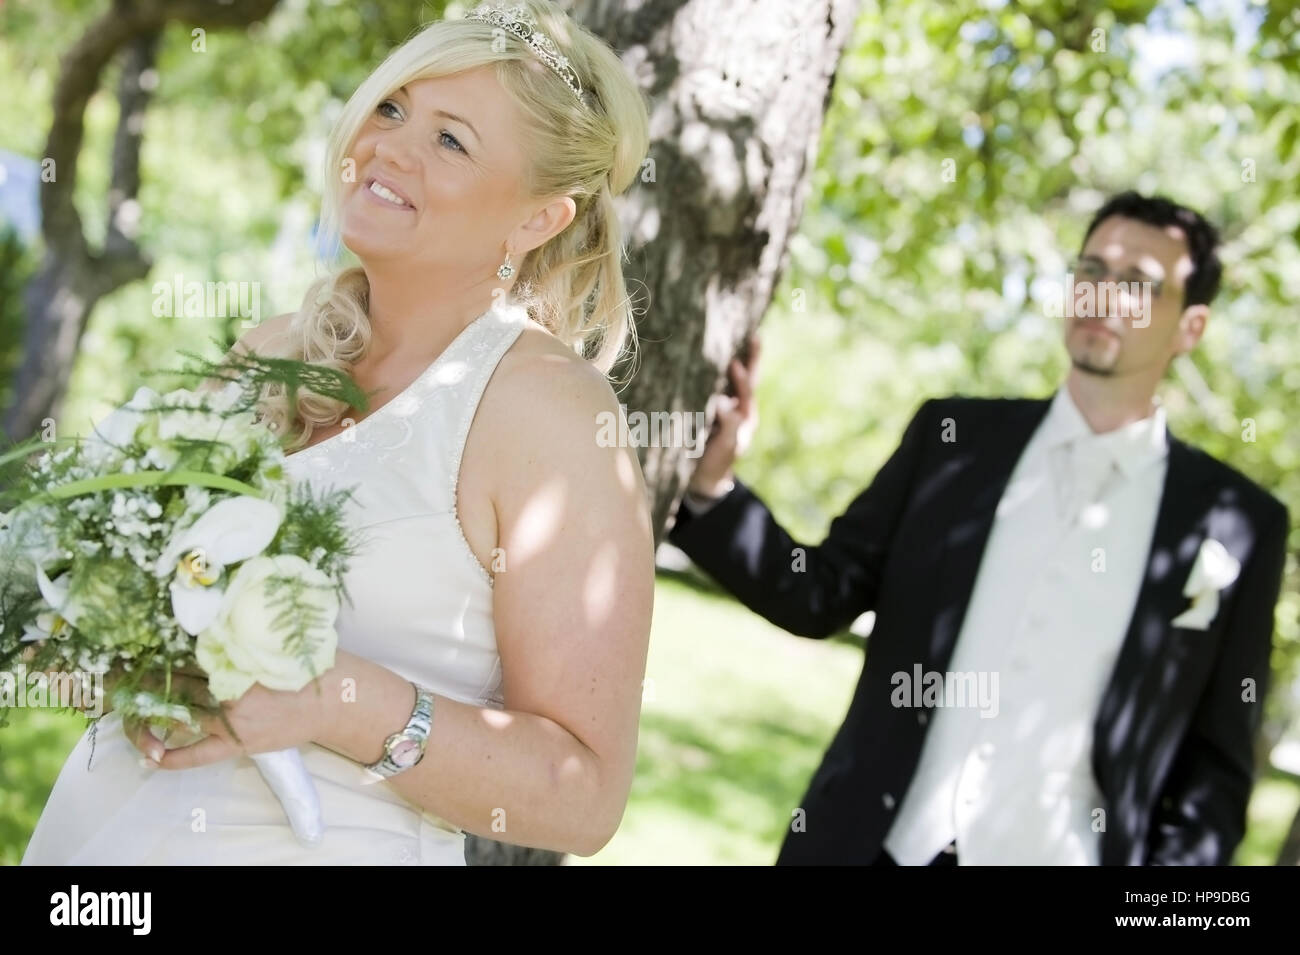 Model released , Brautpaar - marriage couple - Stock Image